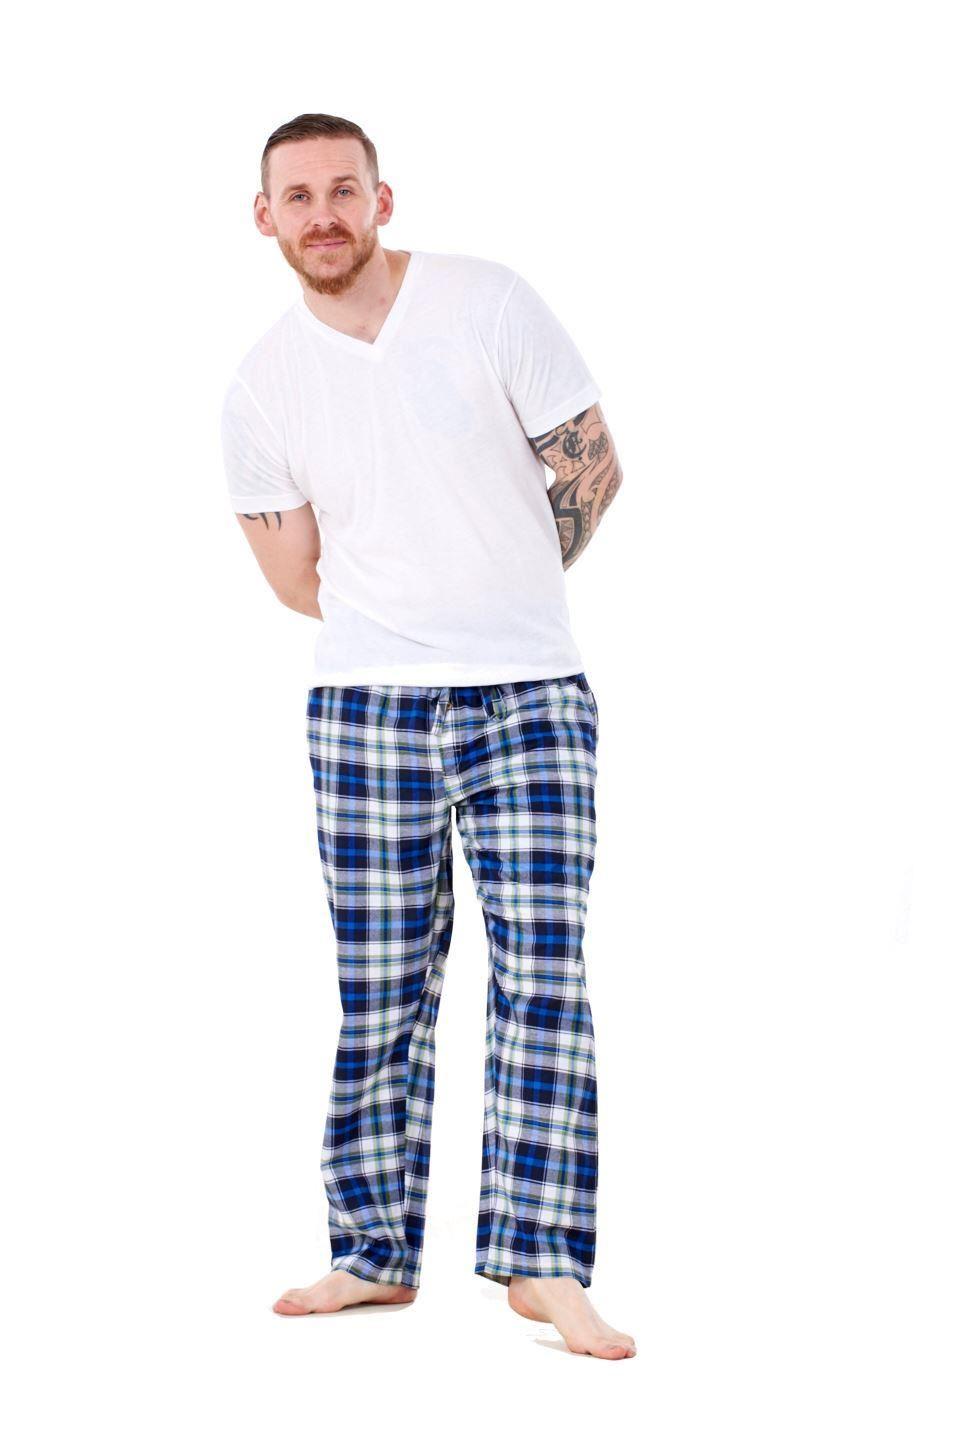 Mens-Pyjama-Bottoms-Rich-Cotton-Woven-Check-Lounge-Pant-Nightwear-Big-3XL-to-5XL Indexbild 46